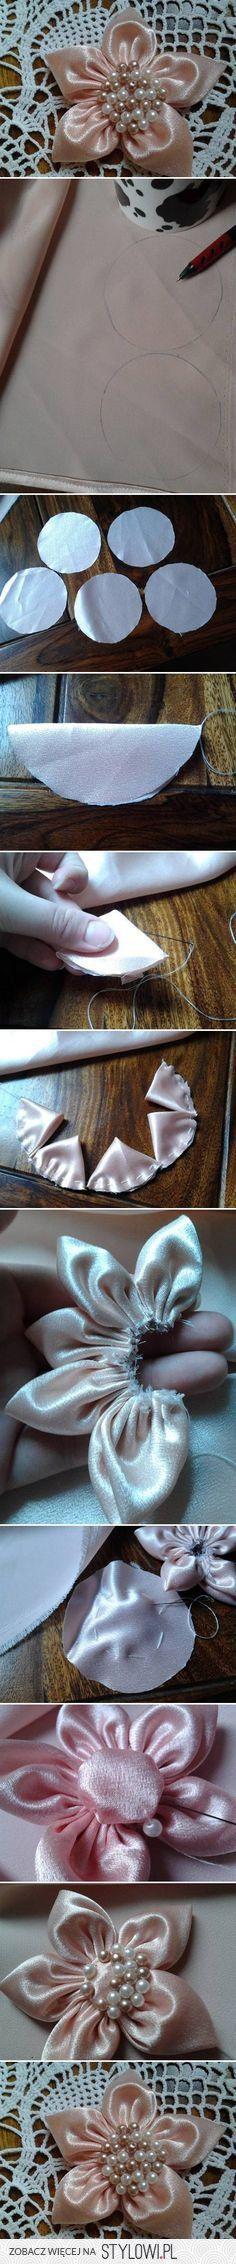 Pin od Karen H na tablicy hair doodles | Pinterest